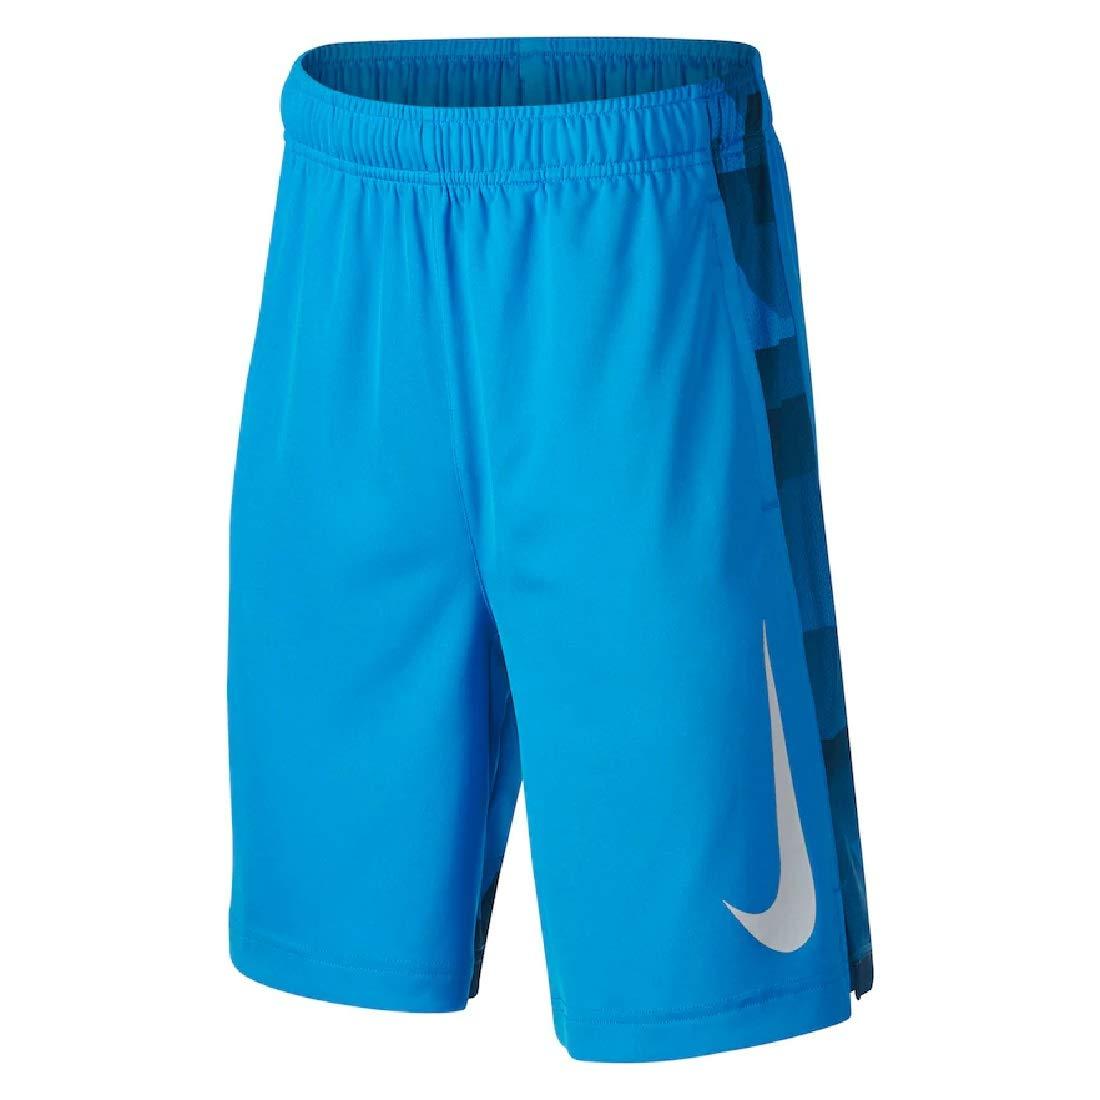 Nike Boys 8-20 Dri-FIT GFX Legacy Shorts (Equator Blue, Small)